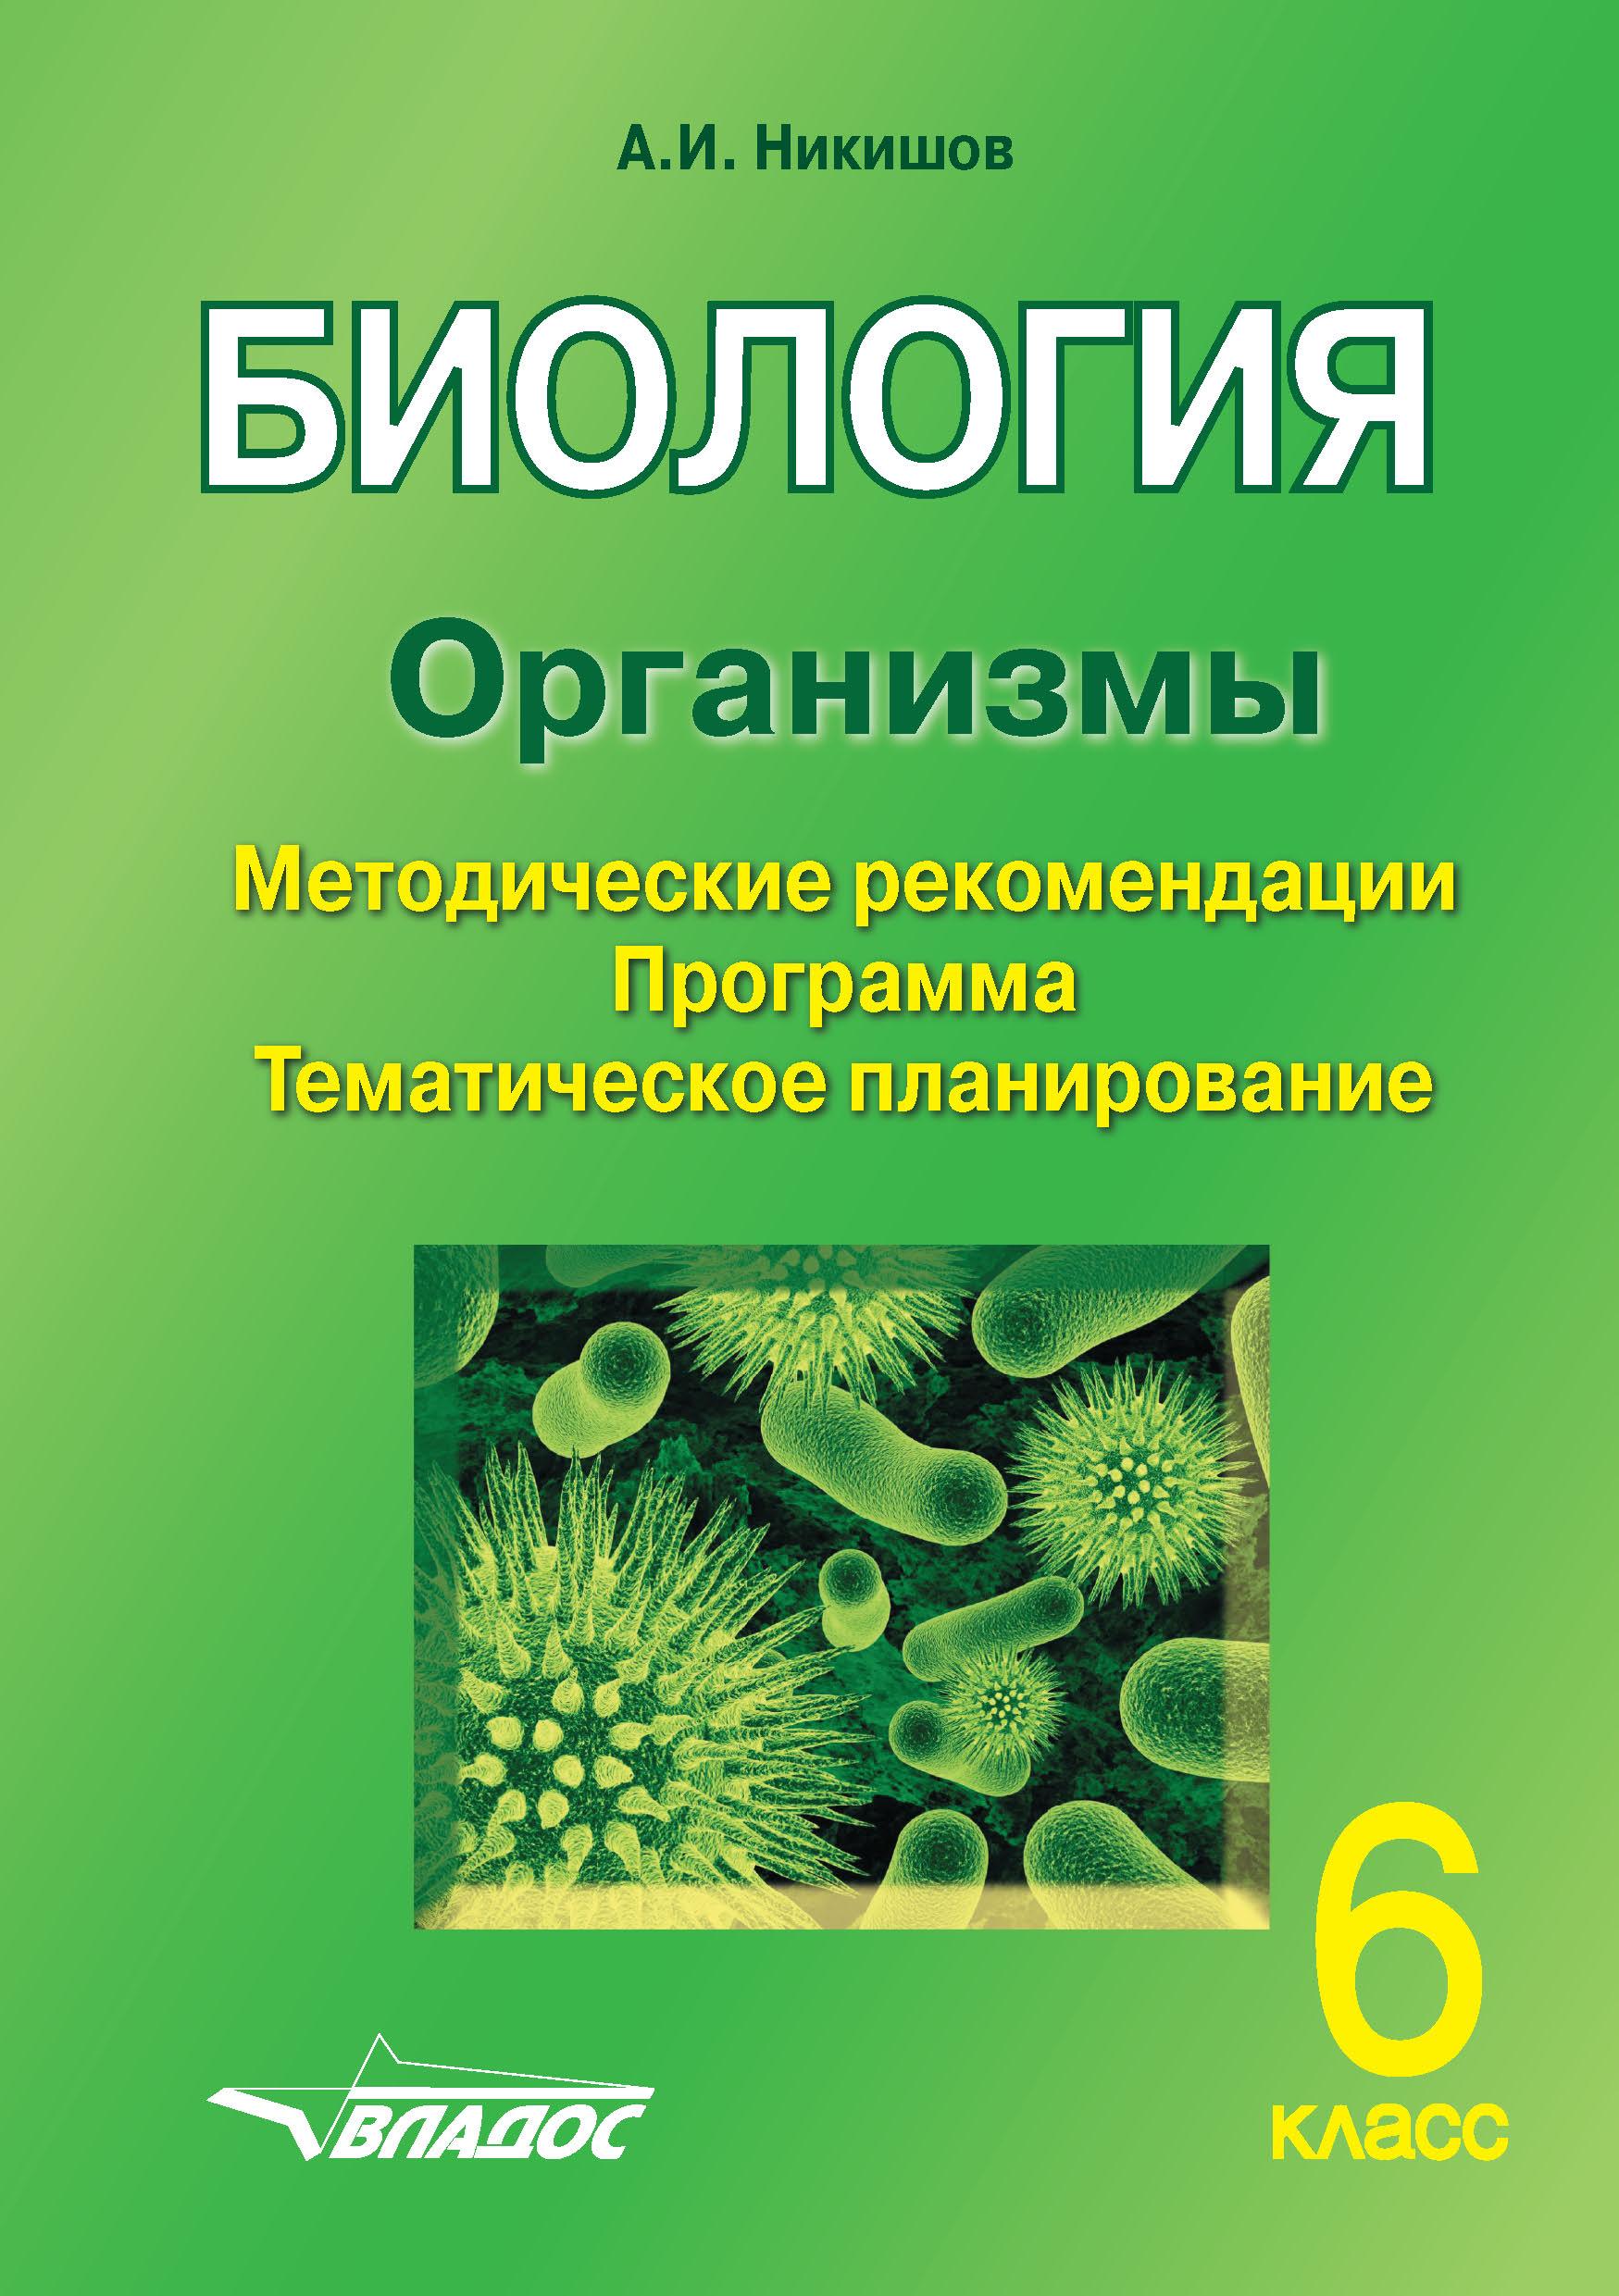 Биология. Организмы. 6 класс ( Александр Иванович Никишов  )